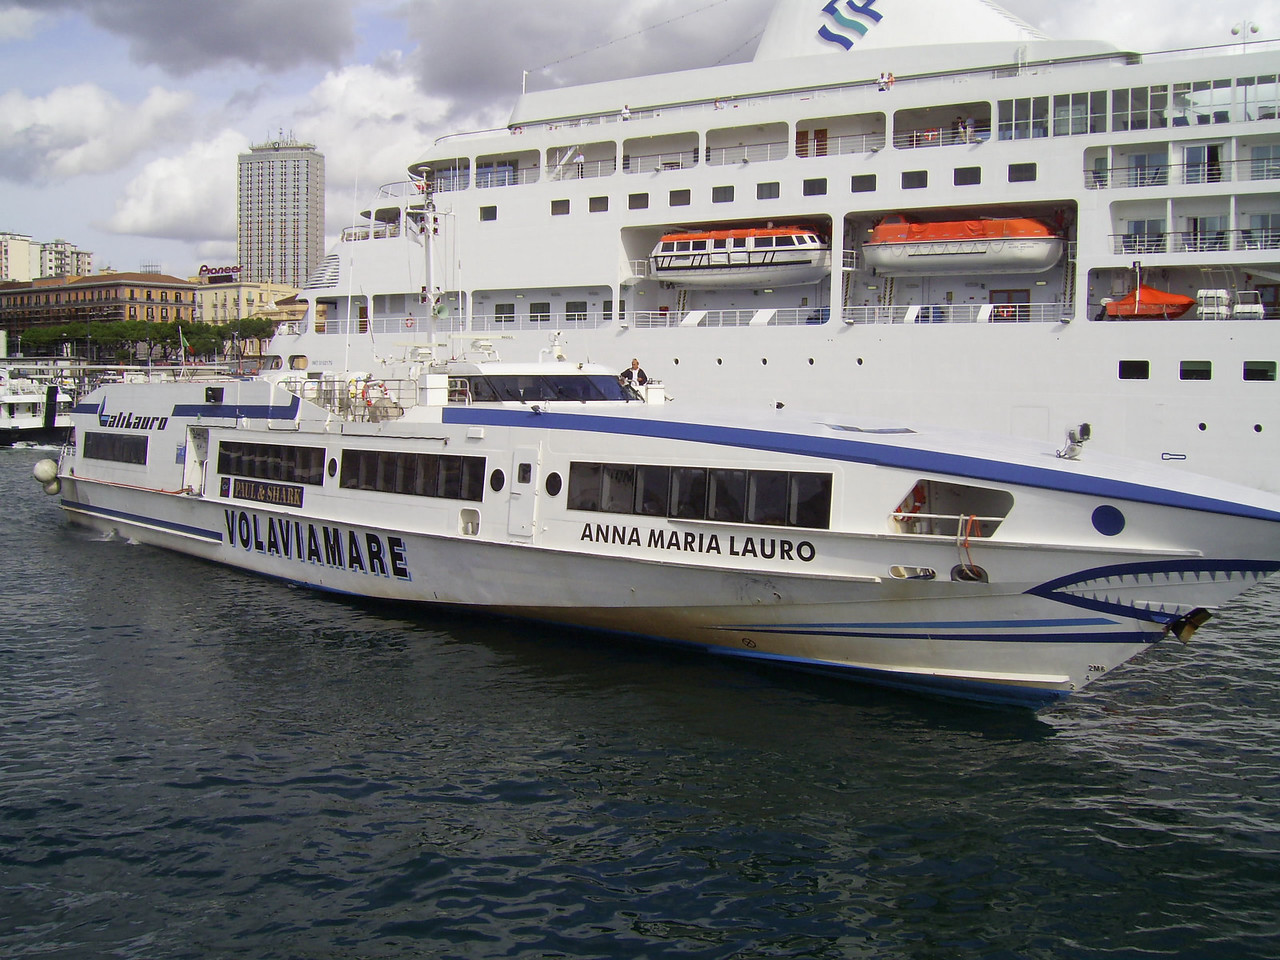 HSC ANNA MARIA LAURO maneuvering in Napoli.